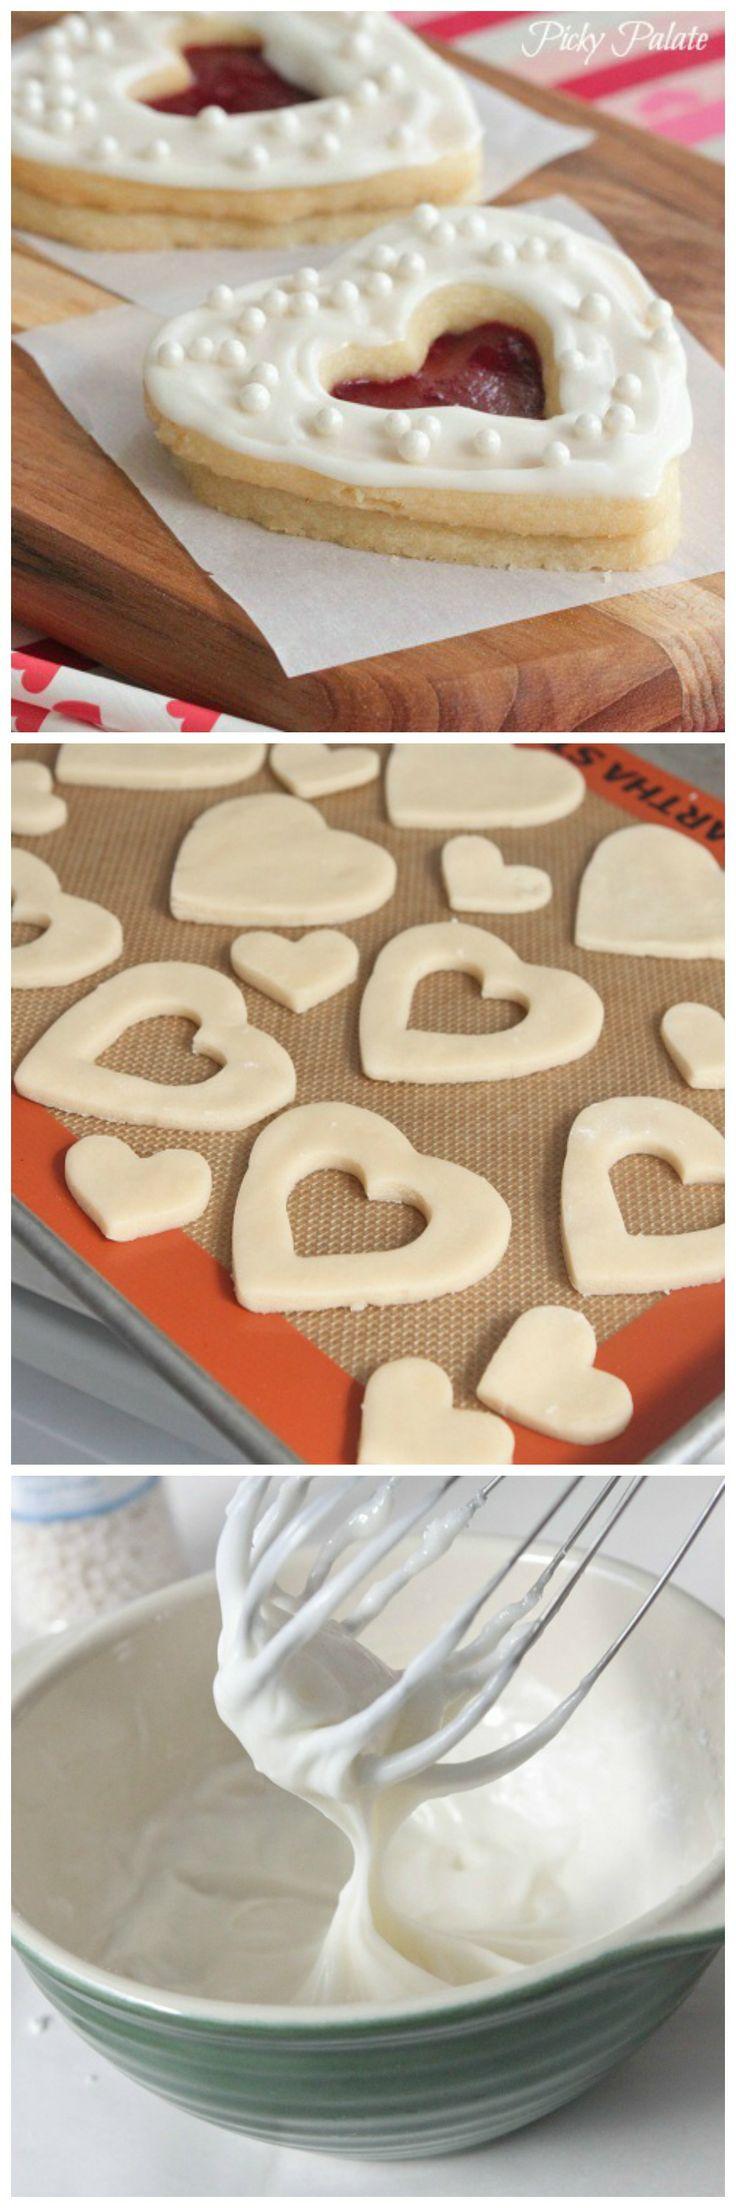 ... Valentine's Day on Pinterest | Valentine cookies, Jokes and Valentines